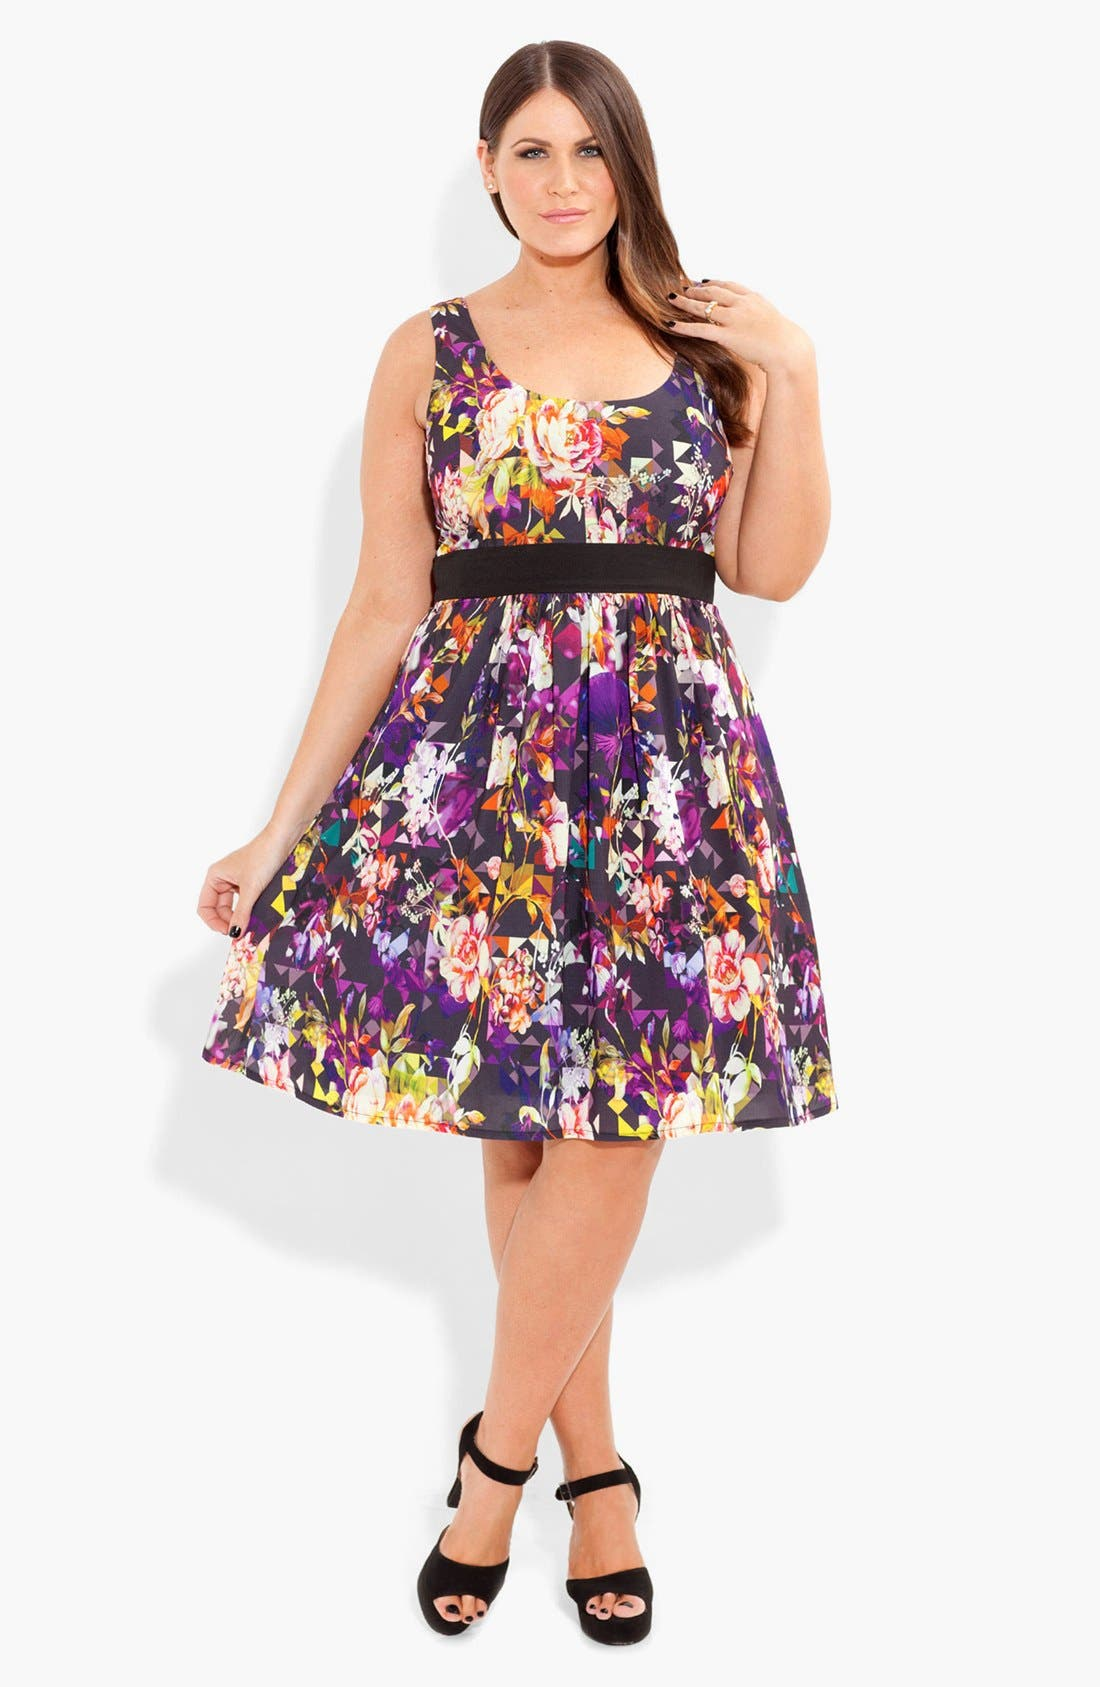 Main Image - City Chic Print Fit & Flare Dress (Plus Size)